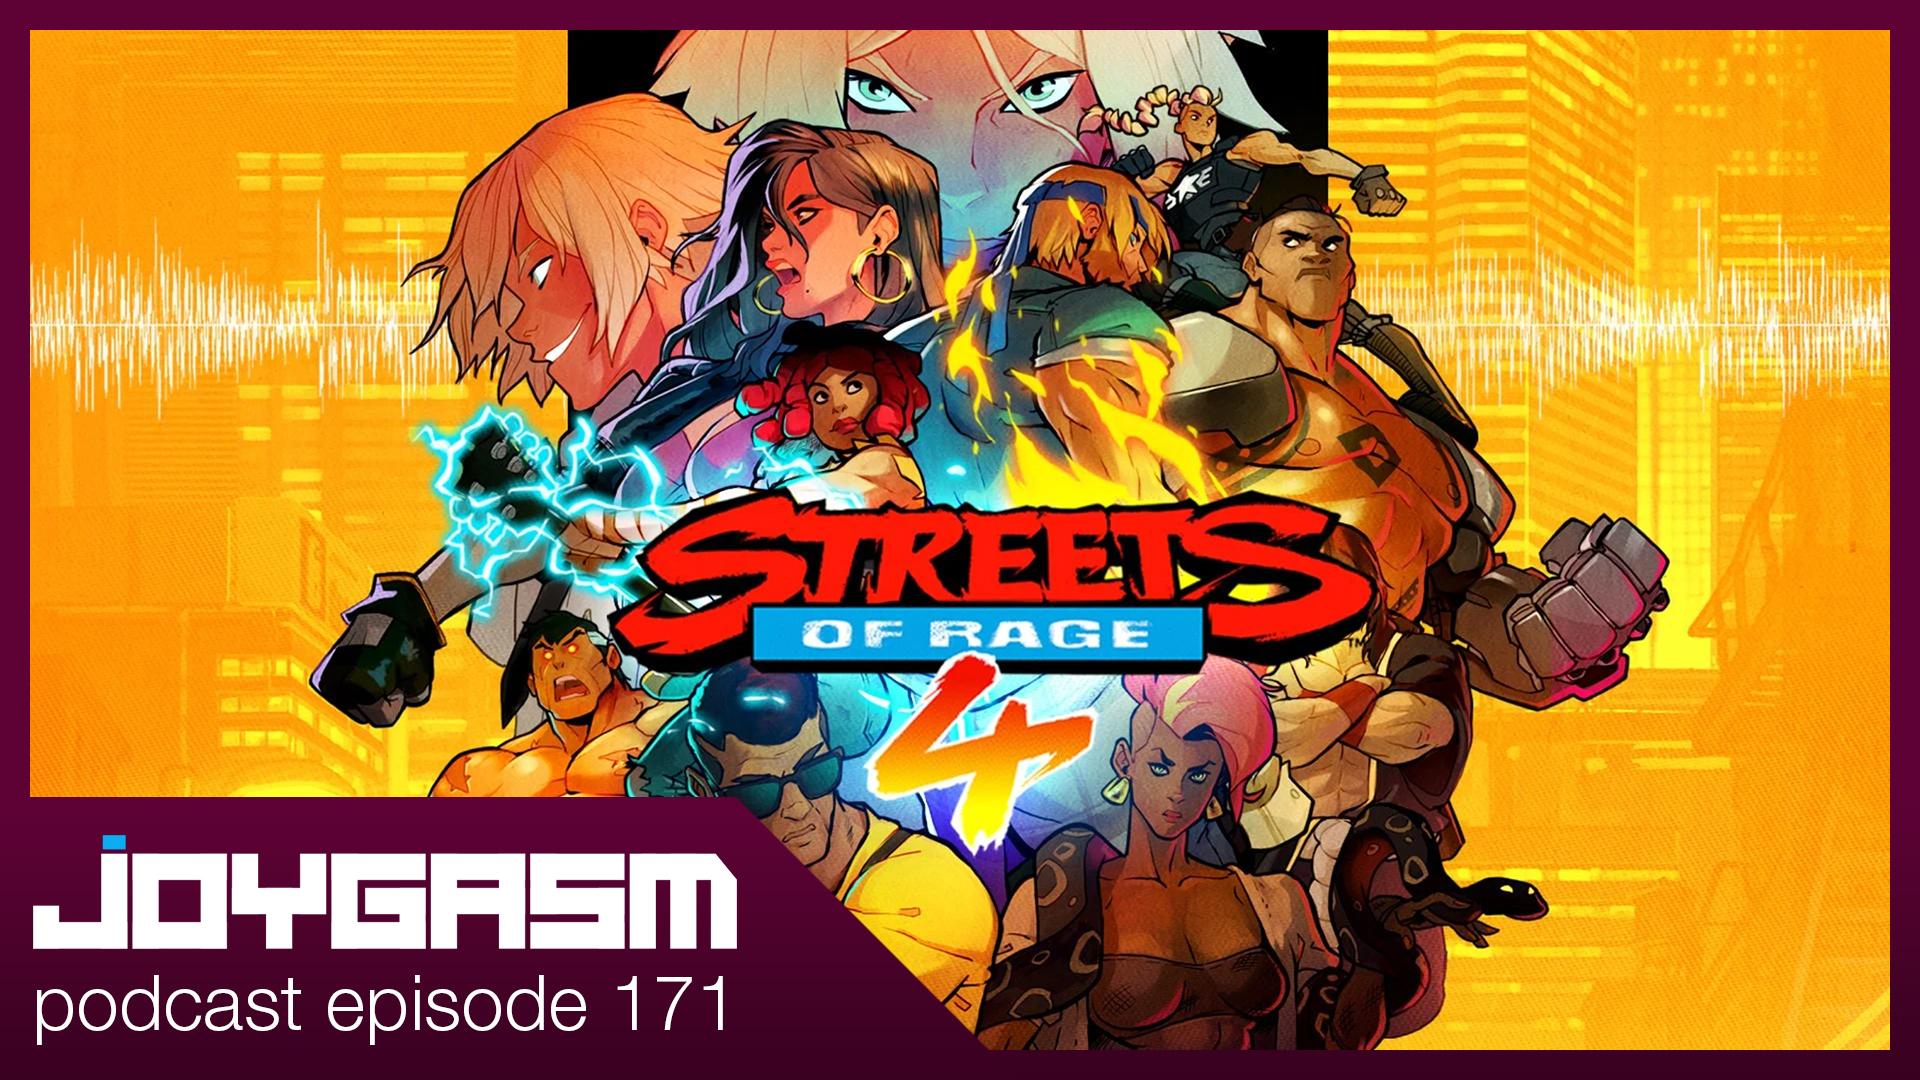 Ep. 171: Streets Of Rage 4 Impressions, Joygasm 3 Year Anniversary, & More